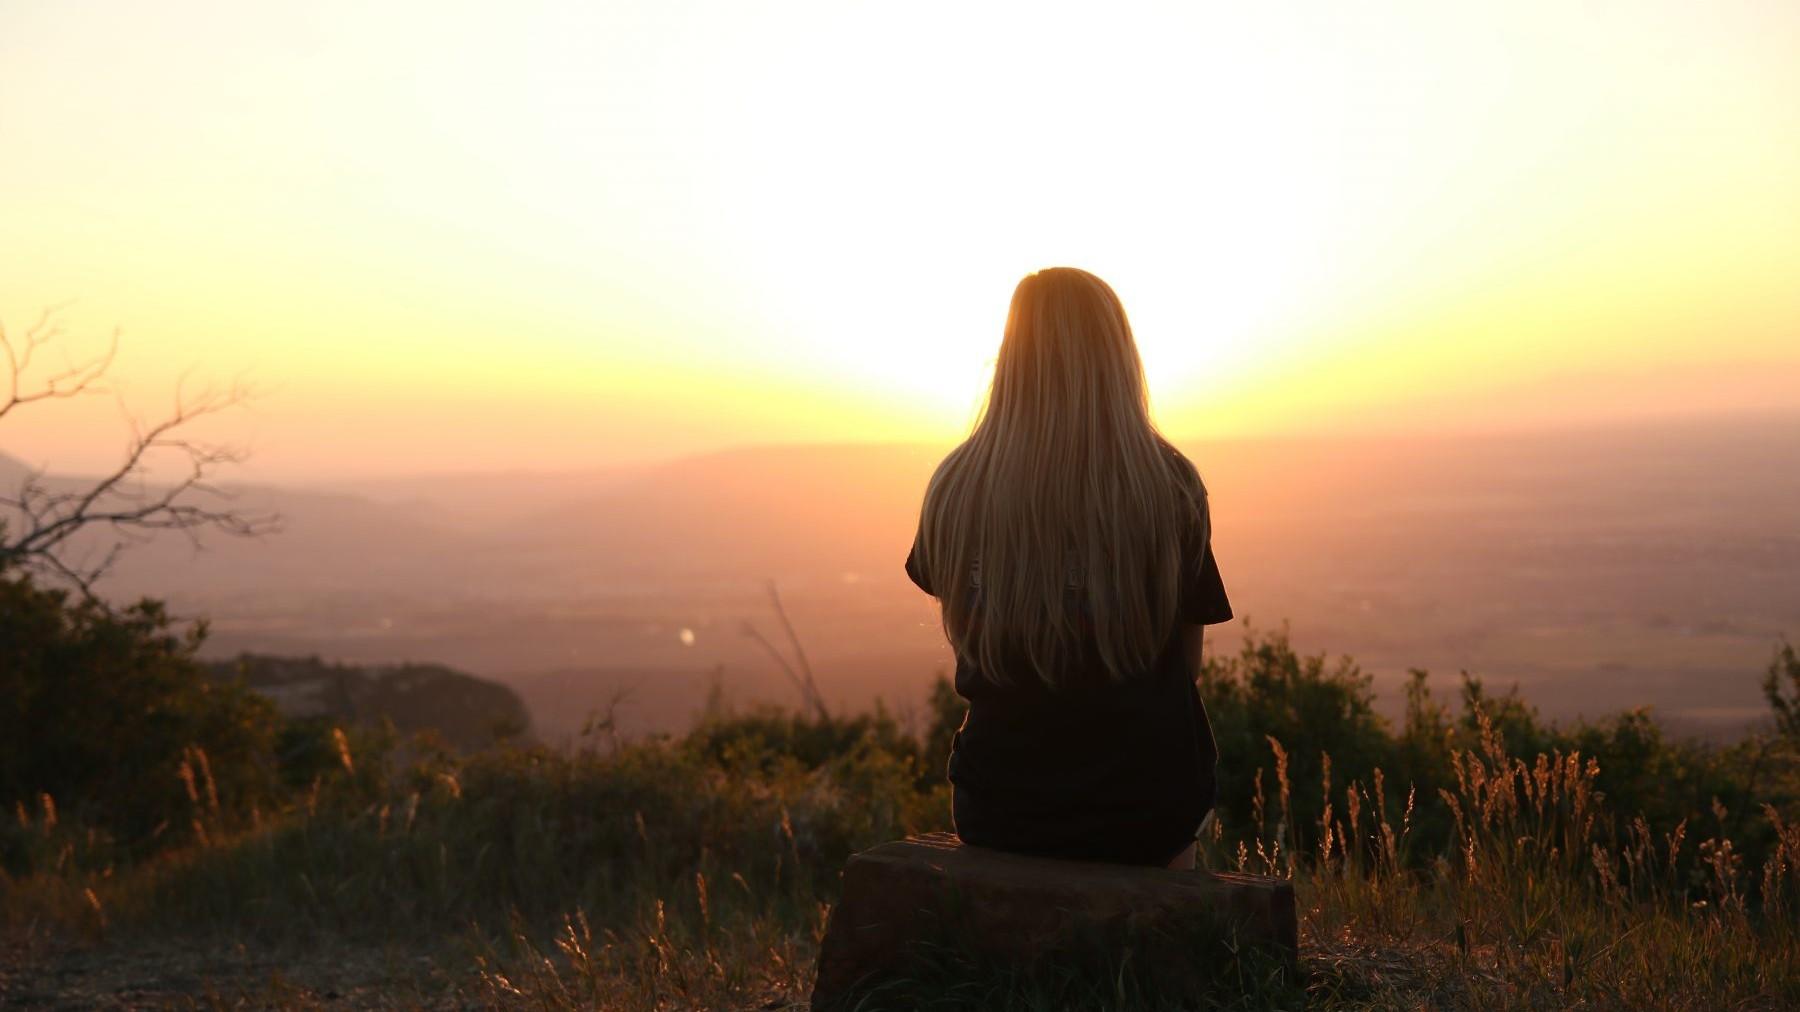 Woman, Lume, Sunset, zonnetje